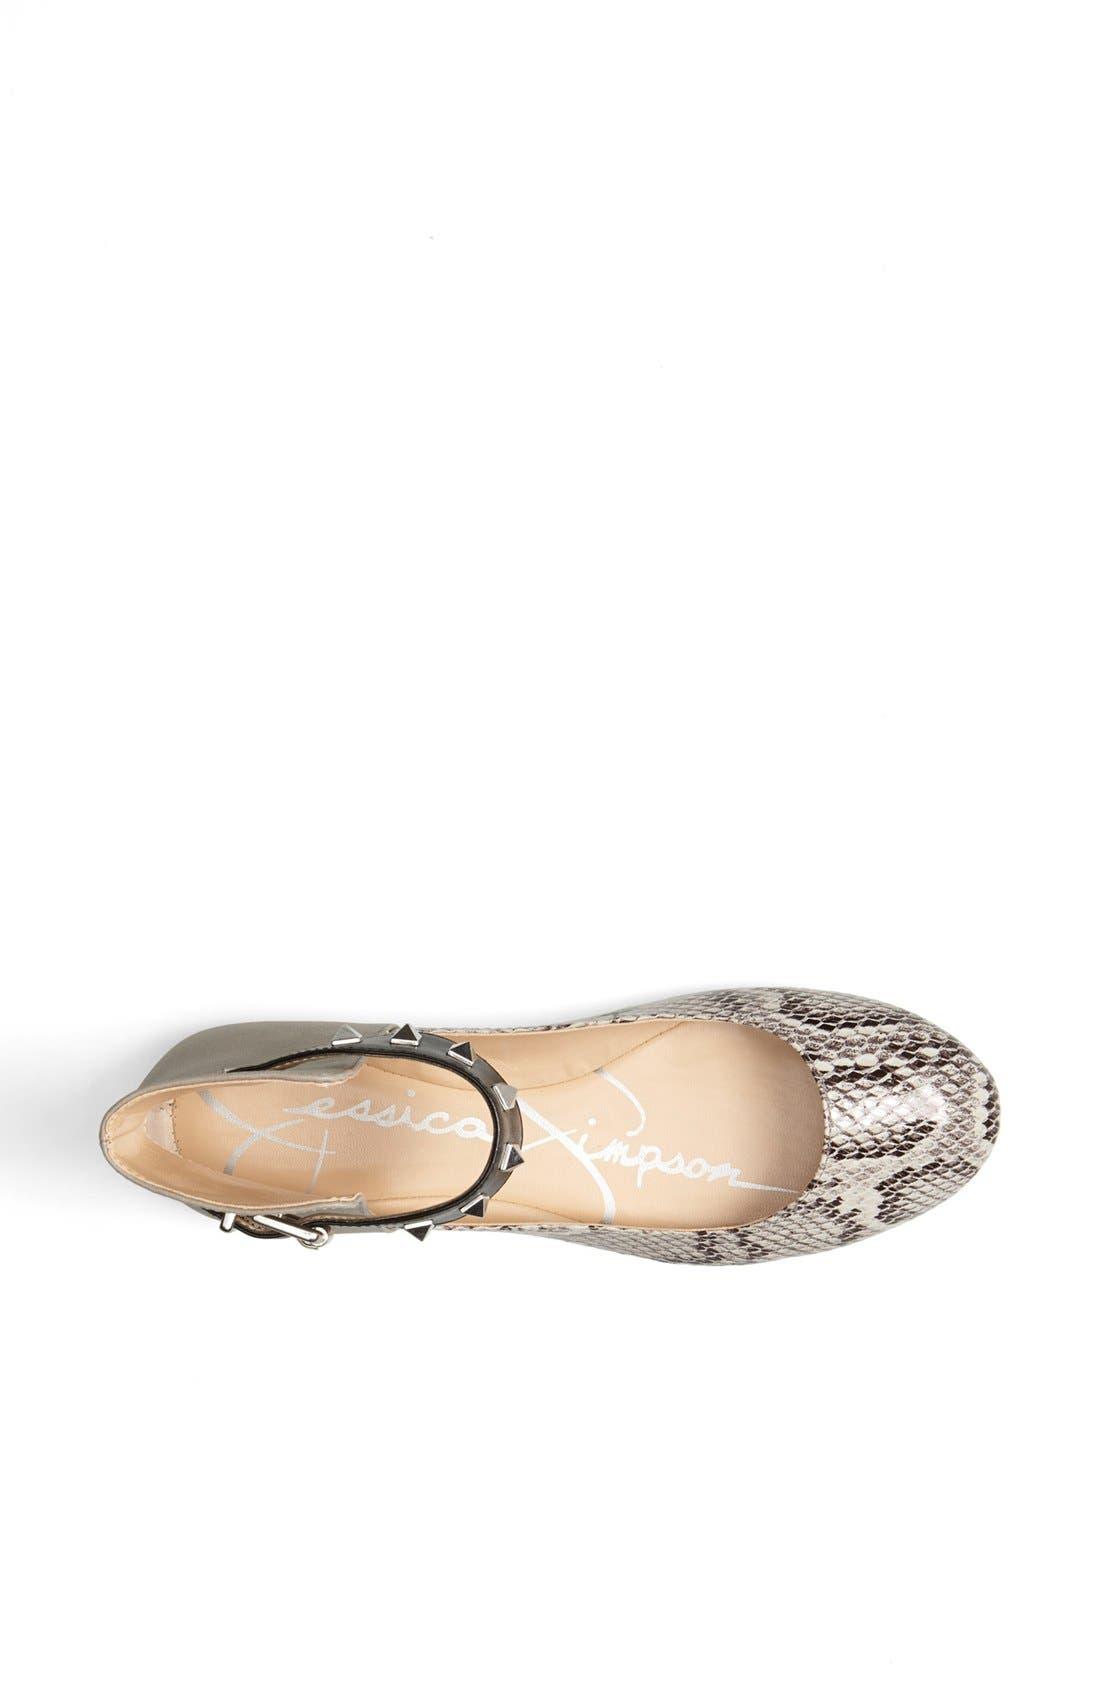 Alternate Image 3  - Jessica Simpson 'Munney' Studded Ankle Strap Flat